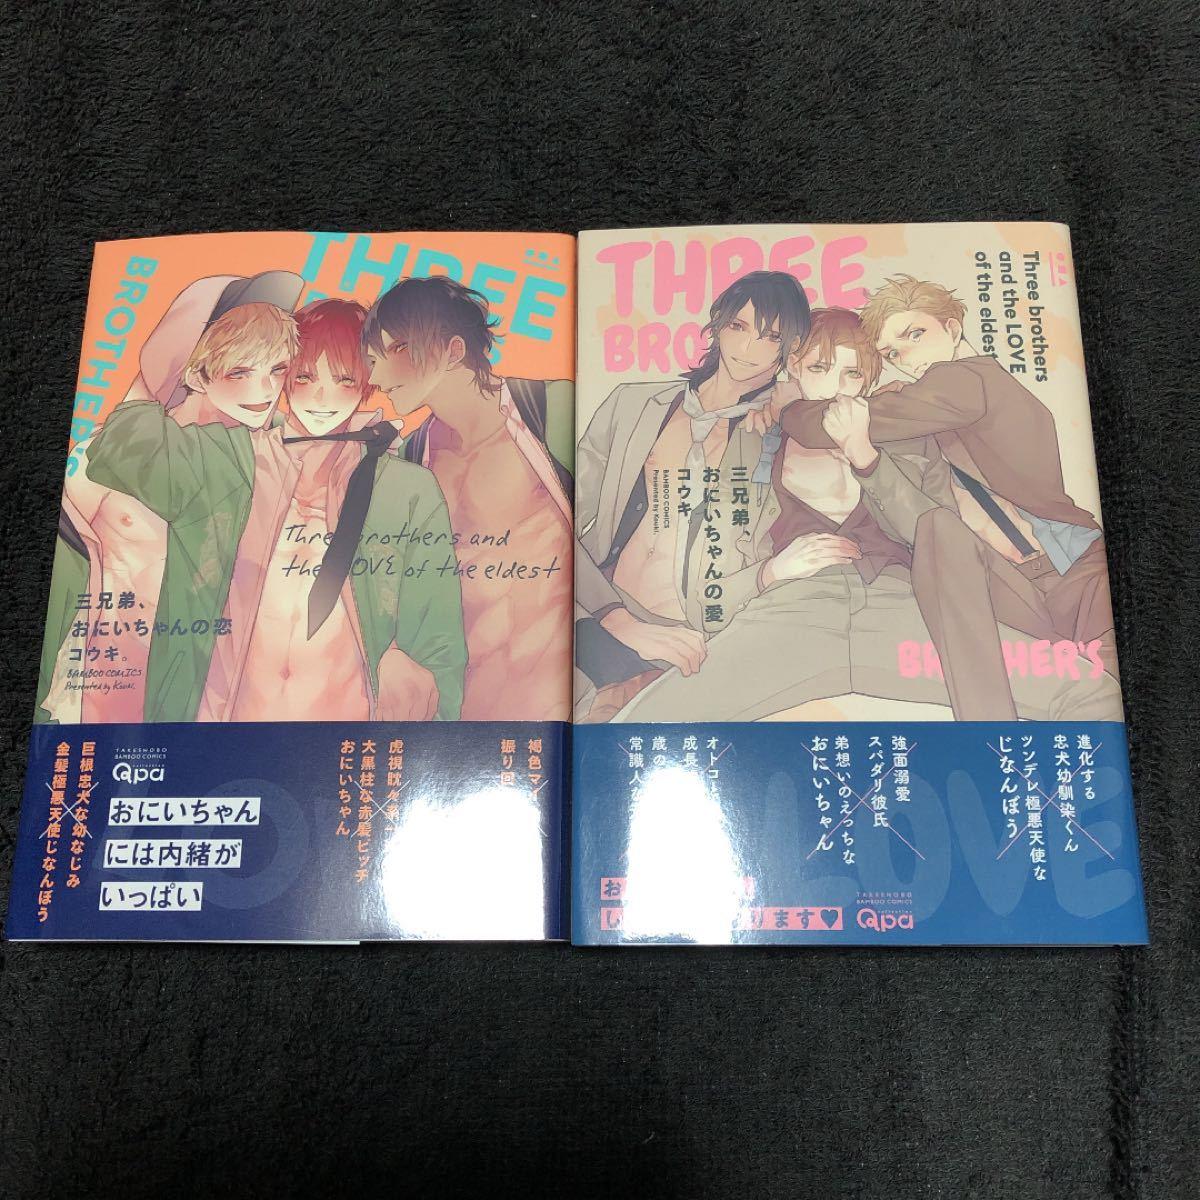 BL漫画 BLコミック BLまとめ売り 三兄弟、おにいちゃんの愛 恋 コウキ